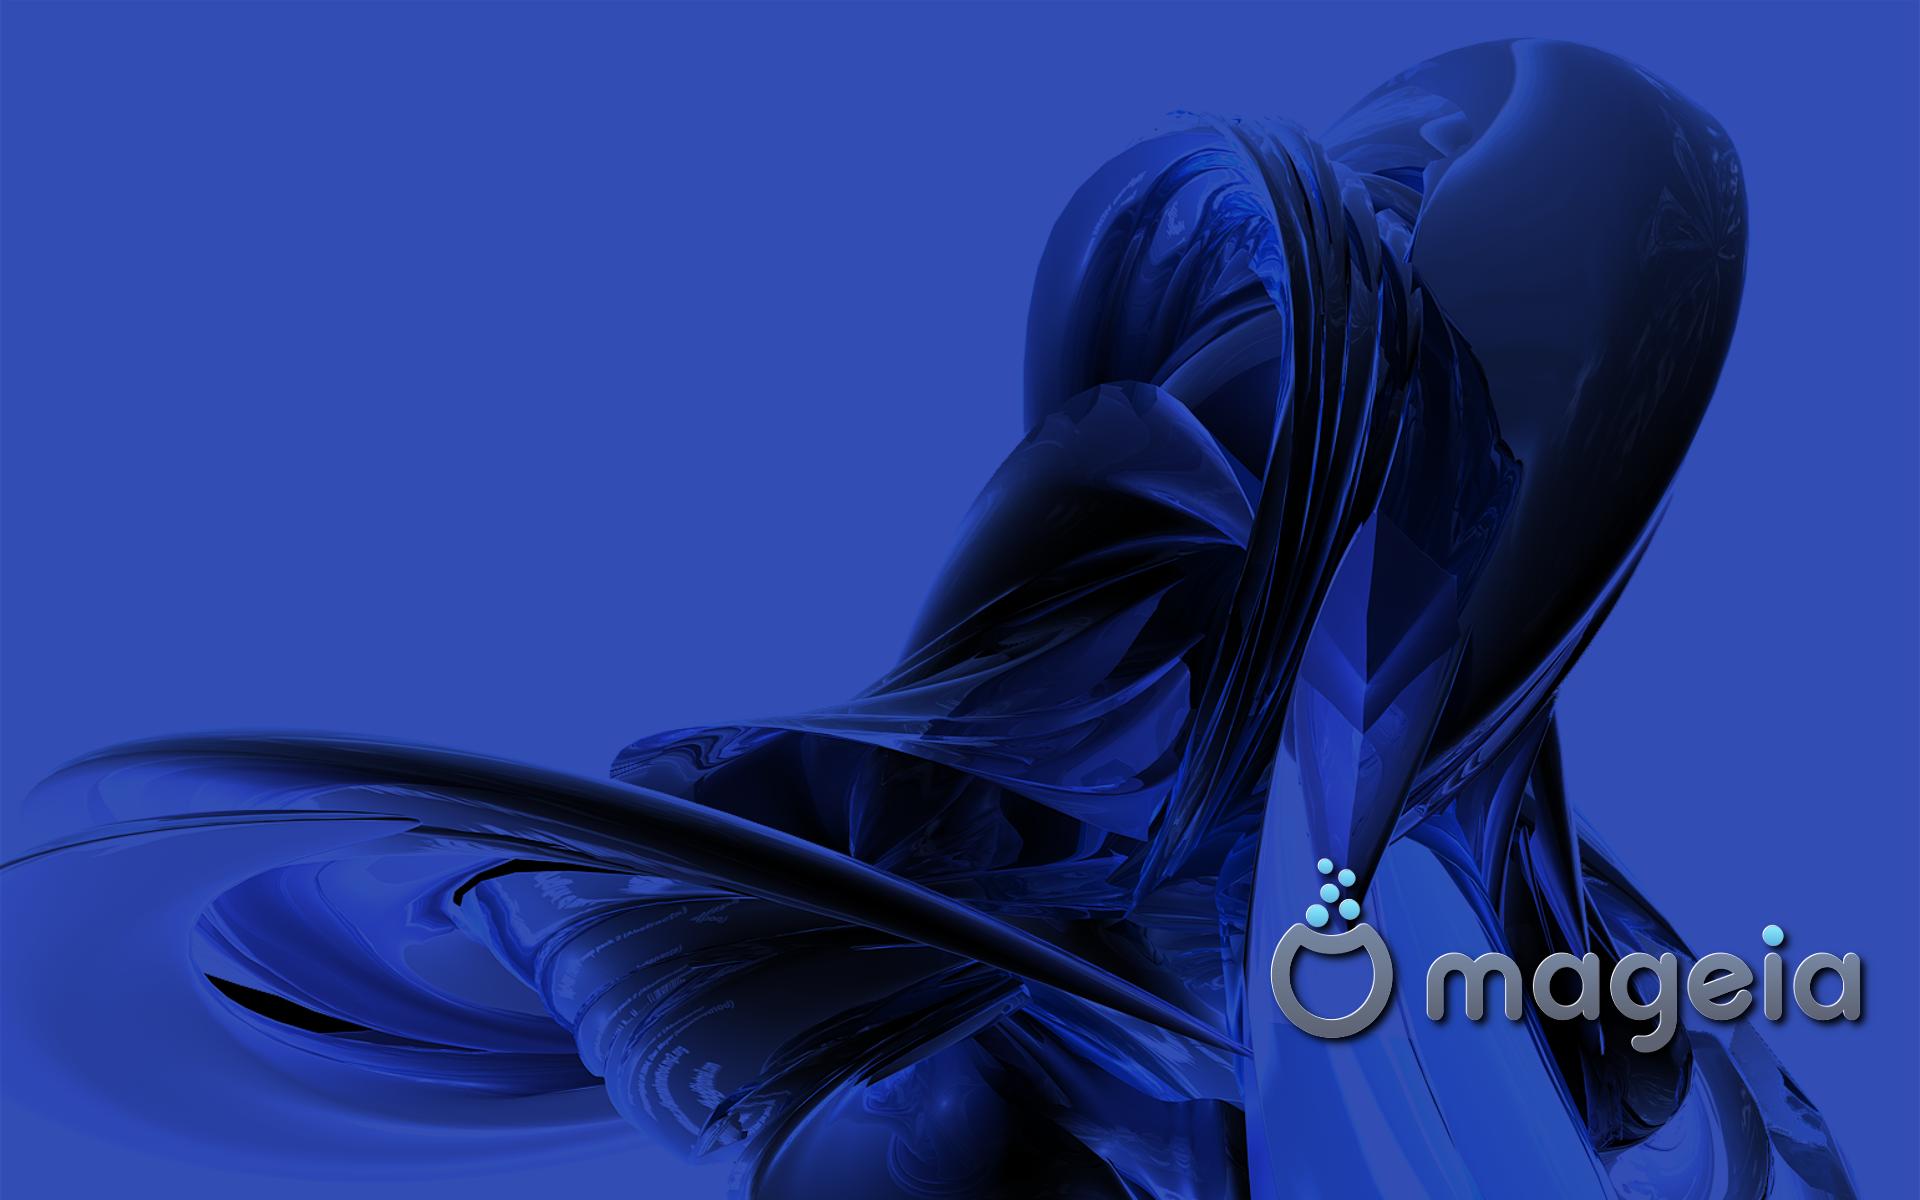 Mageia Azul   Wallpapers 1920x1200